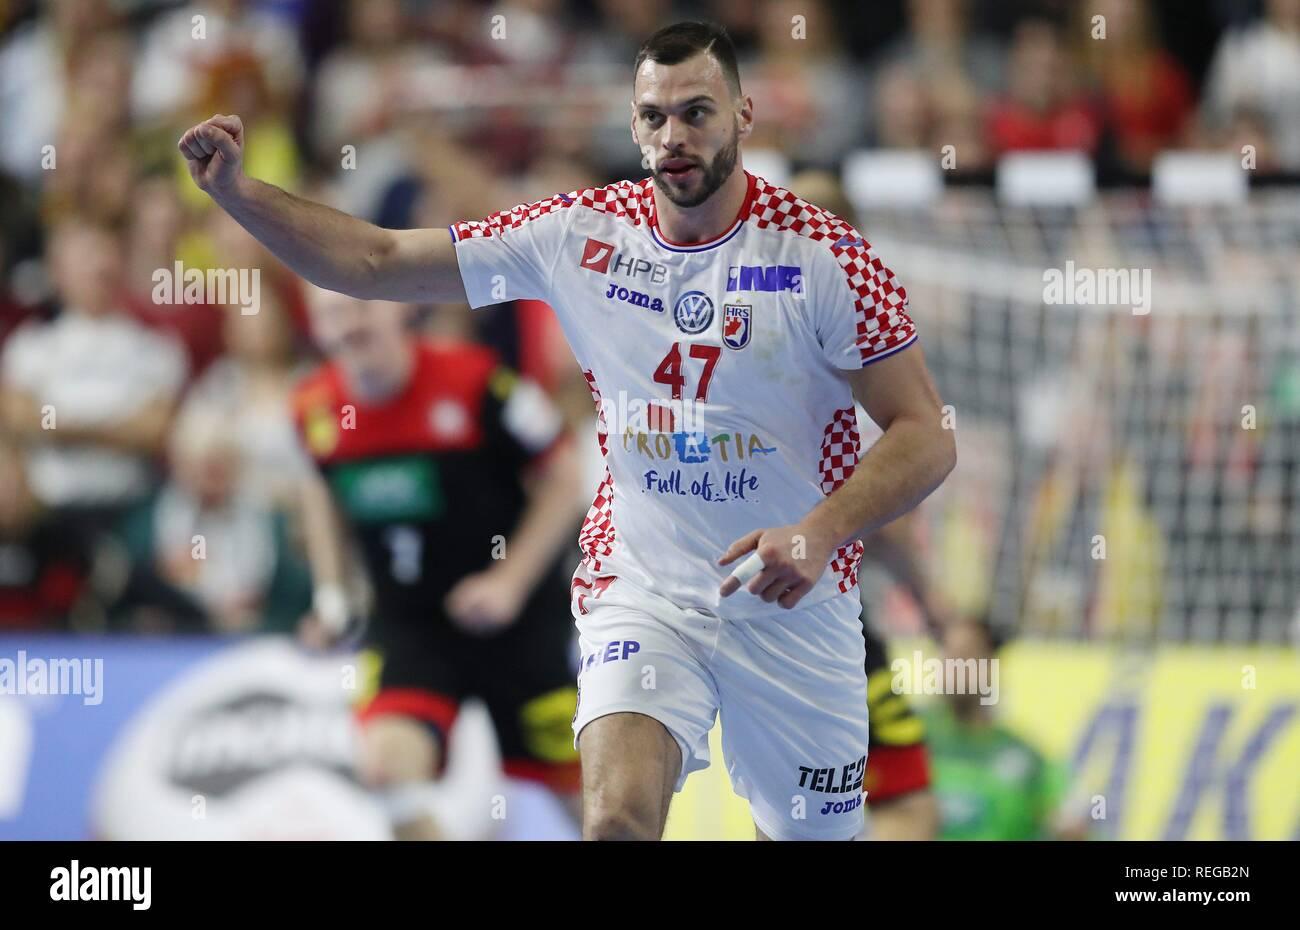 firo: 21.01.2019, Handball: World Cup World Cup Main Round Croatia Croatia - Germany 21:22 jubilation, Jakov Vrankovic, CRO   usage worldwide - Stock Image